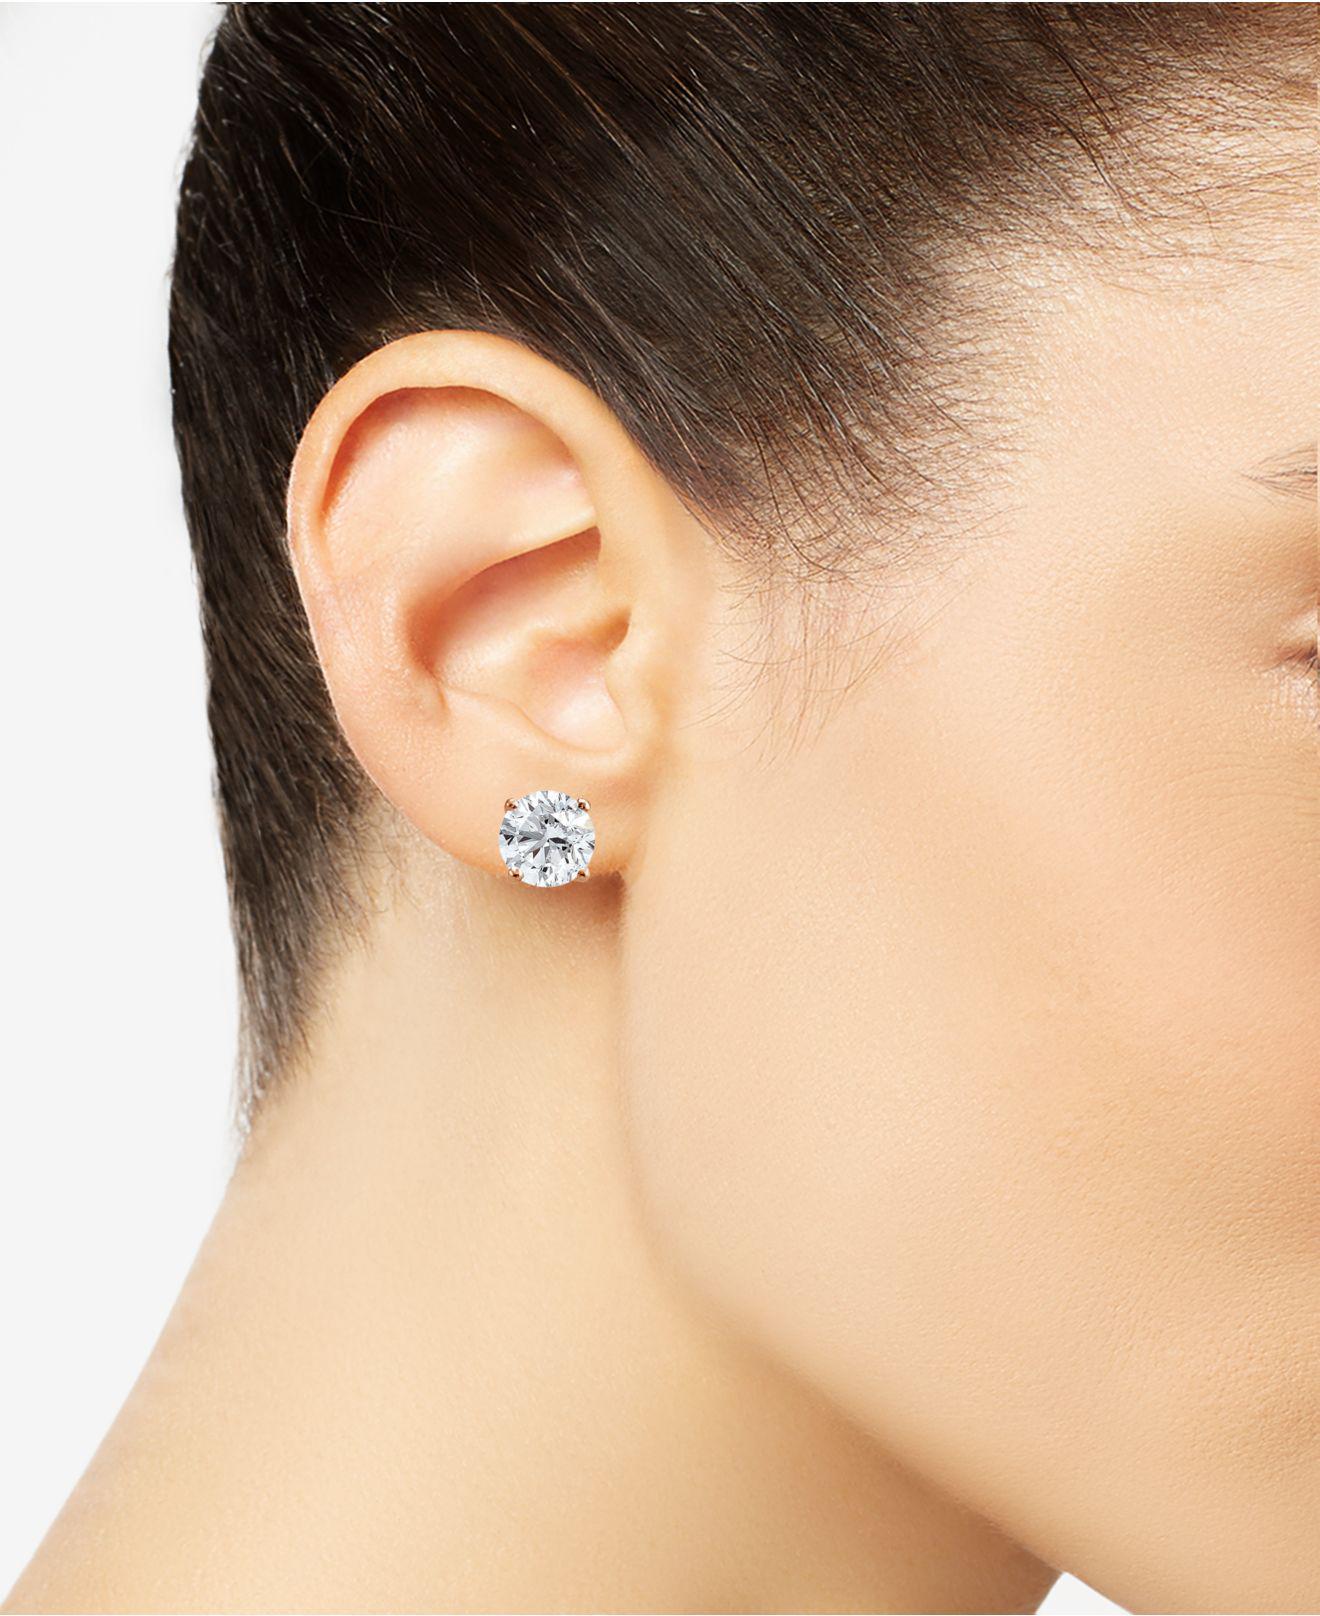 326854449 Lyst - Giani Bernini Cubic Zirconia Stud Earrings In 18k Rose Gold-plated  Sterling Silver in Metallic